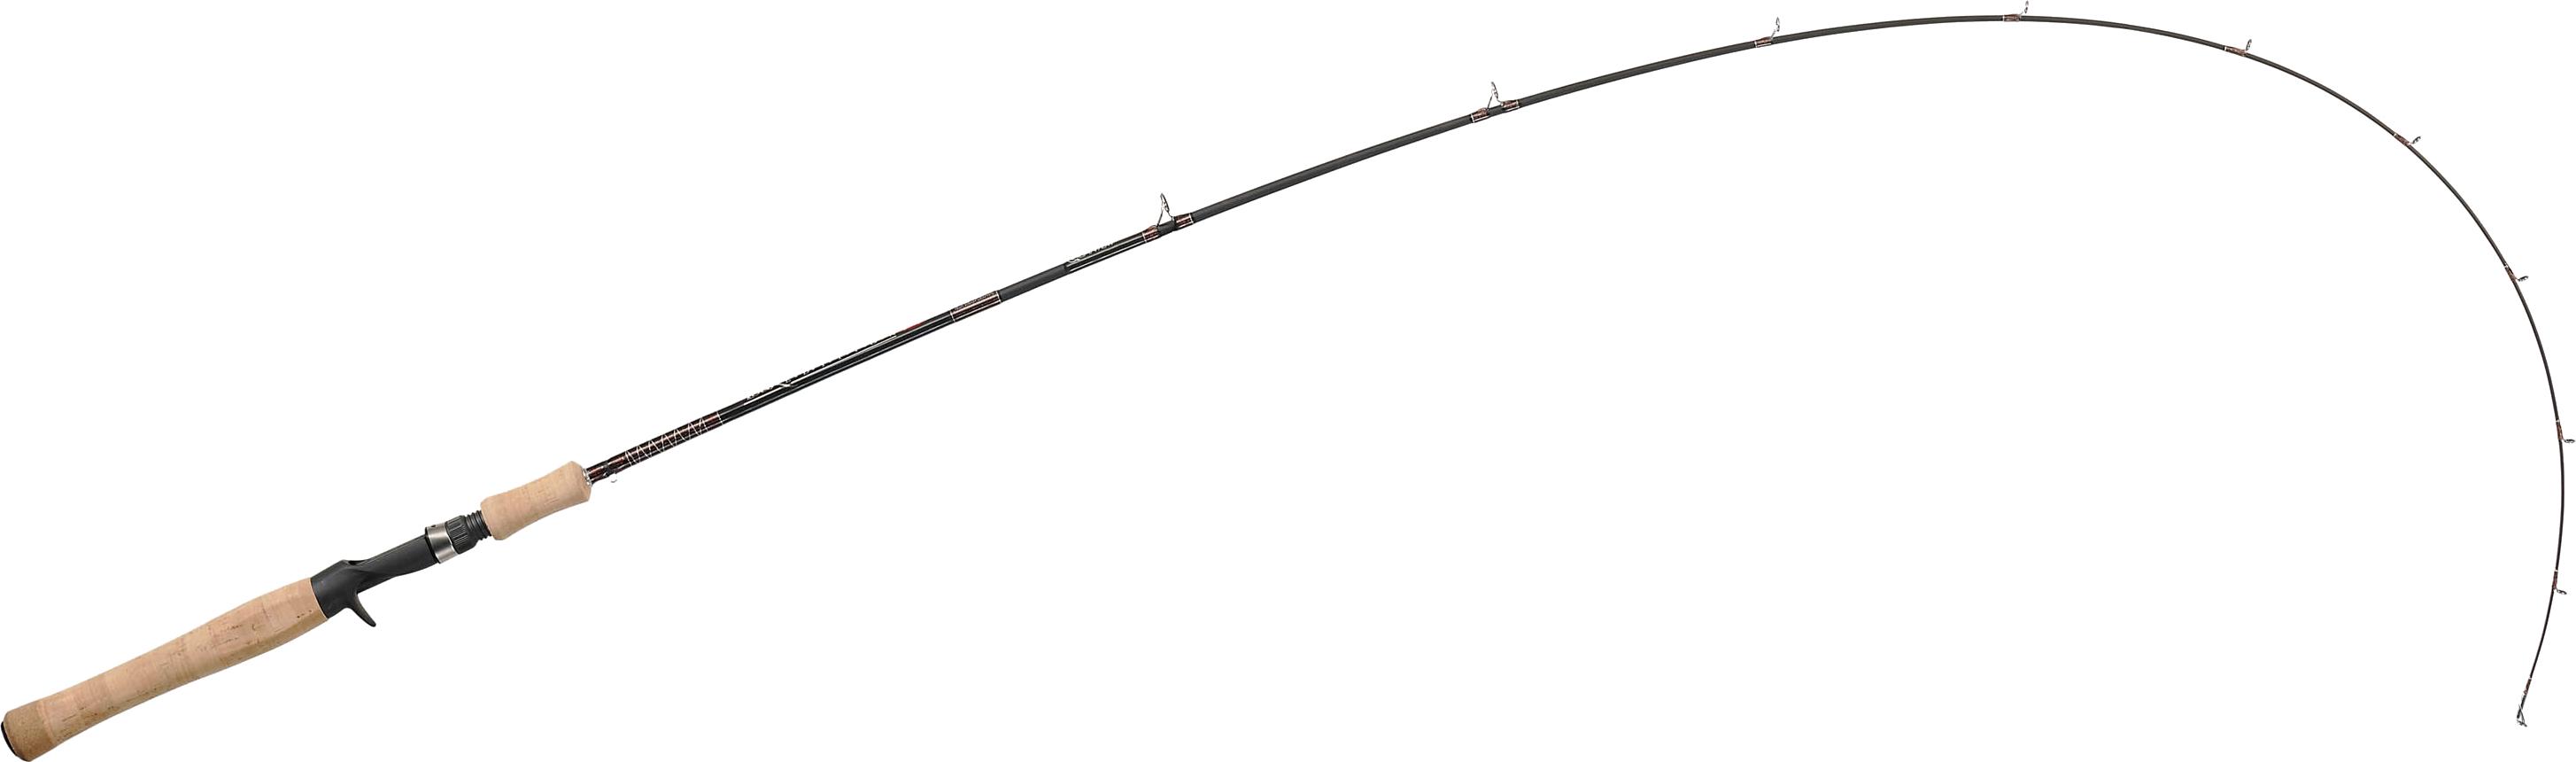 Lines clipart fishing pole Fishing rod fishing image images